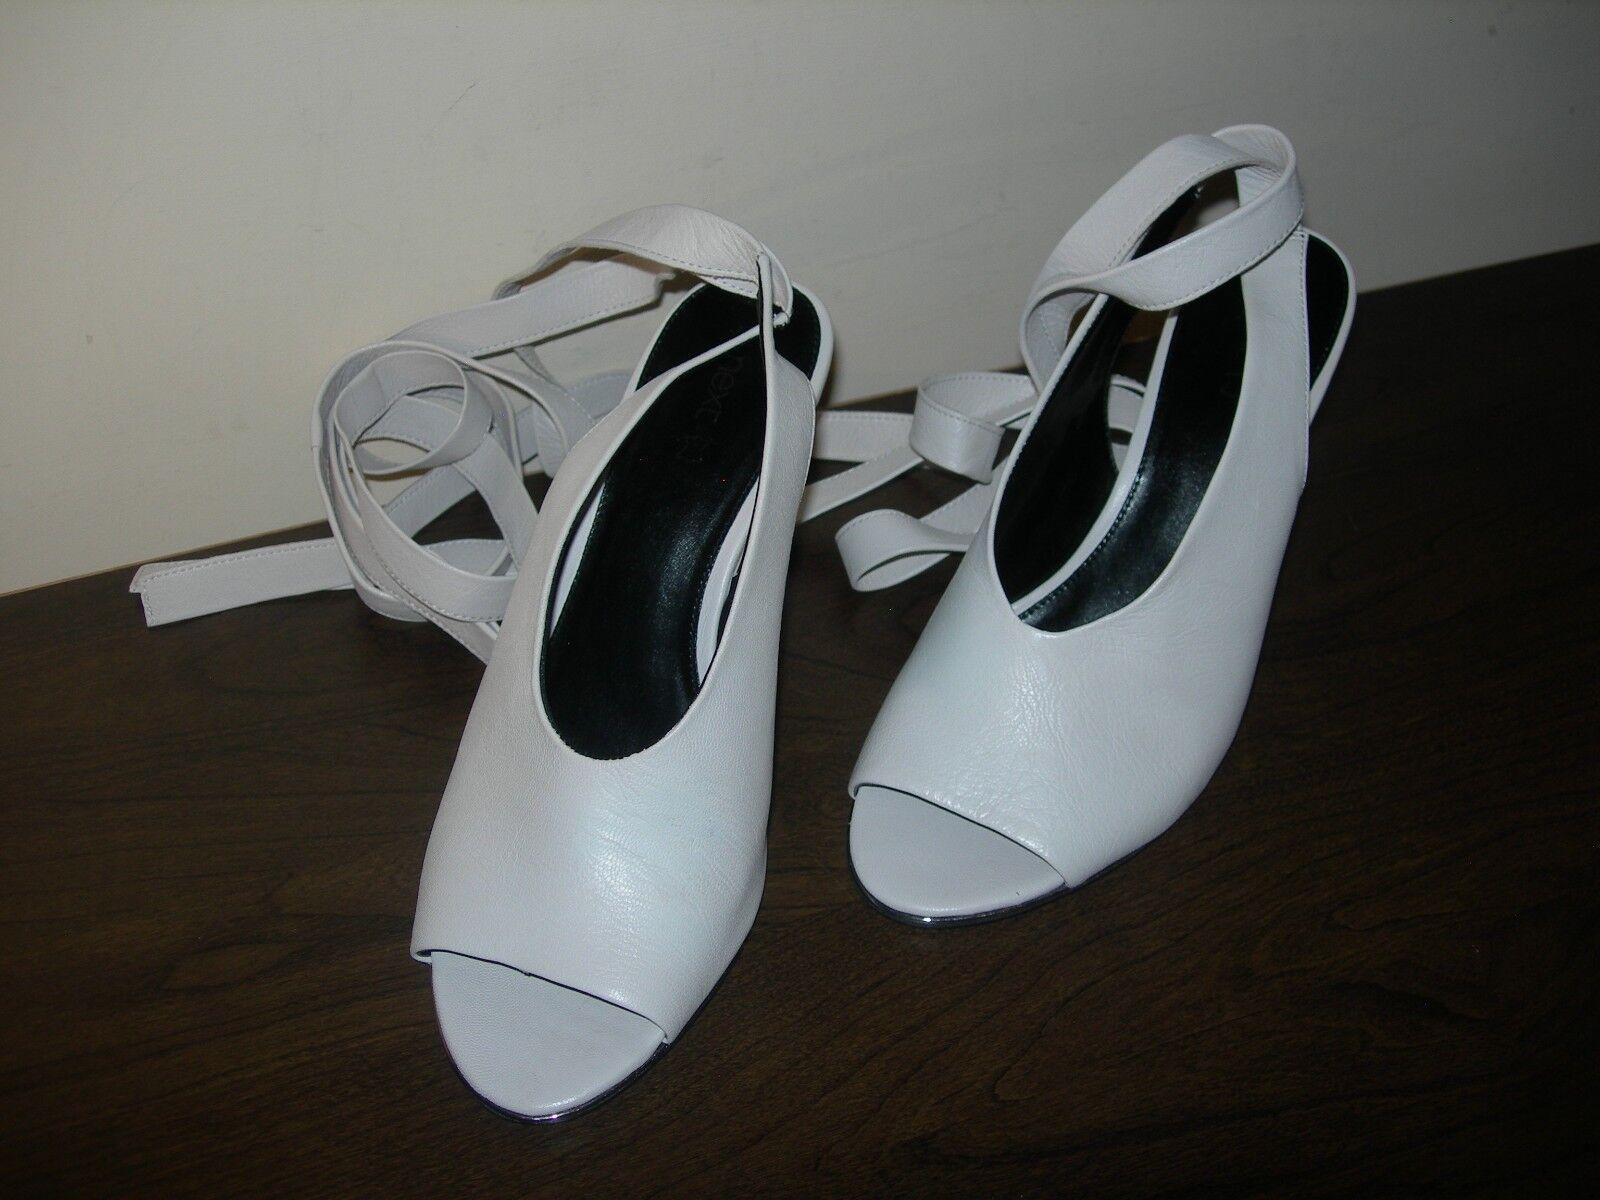 NEXT damen schuhe schuhe schuhe SANDALS WEDGES OPEN TOES LEG TIES CREAM LEATHER EU 41   UK 7 03e457